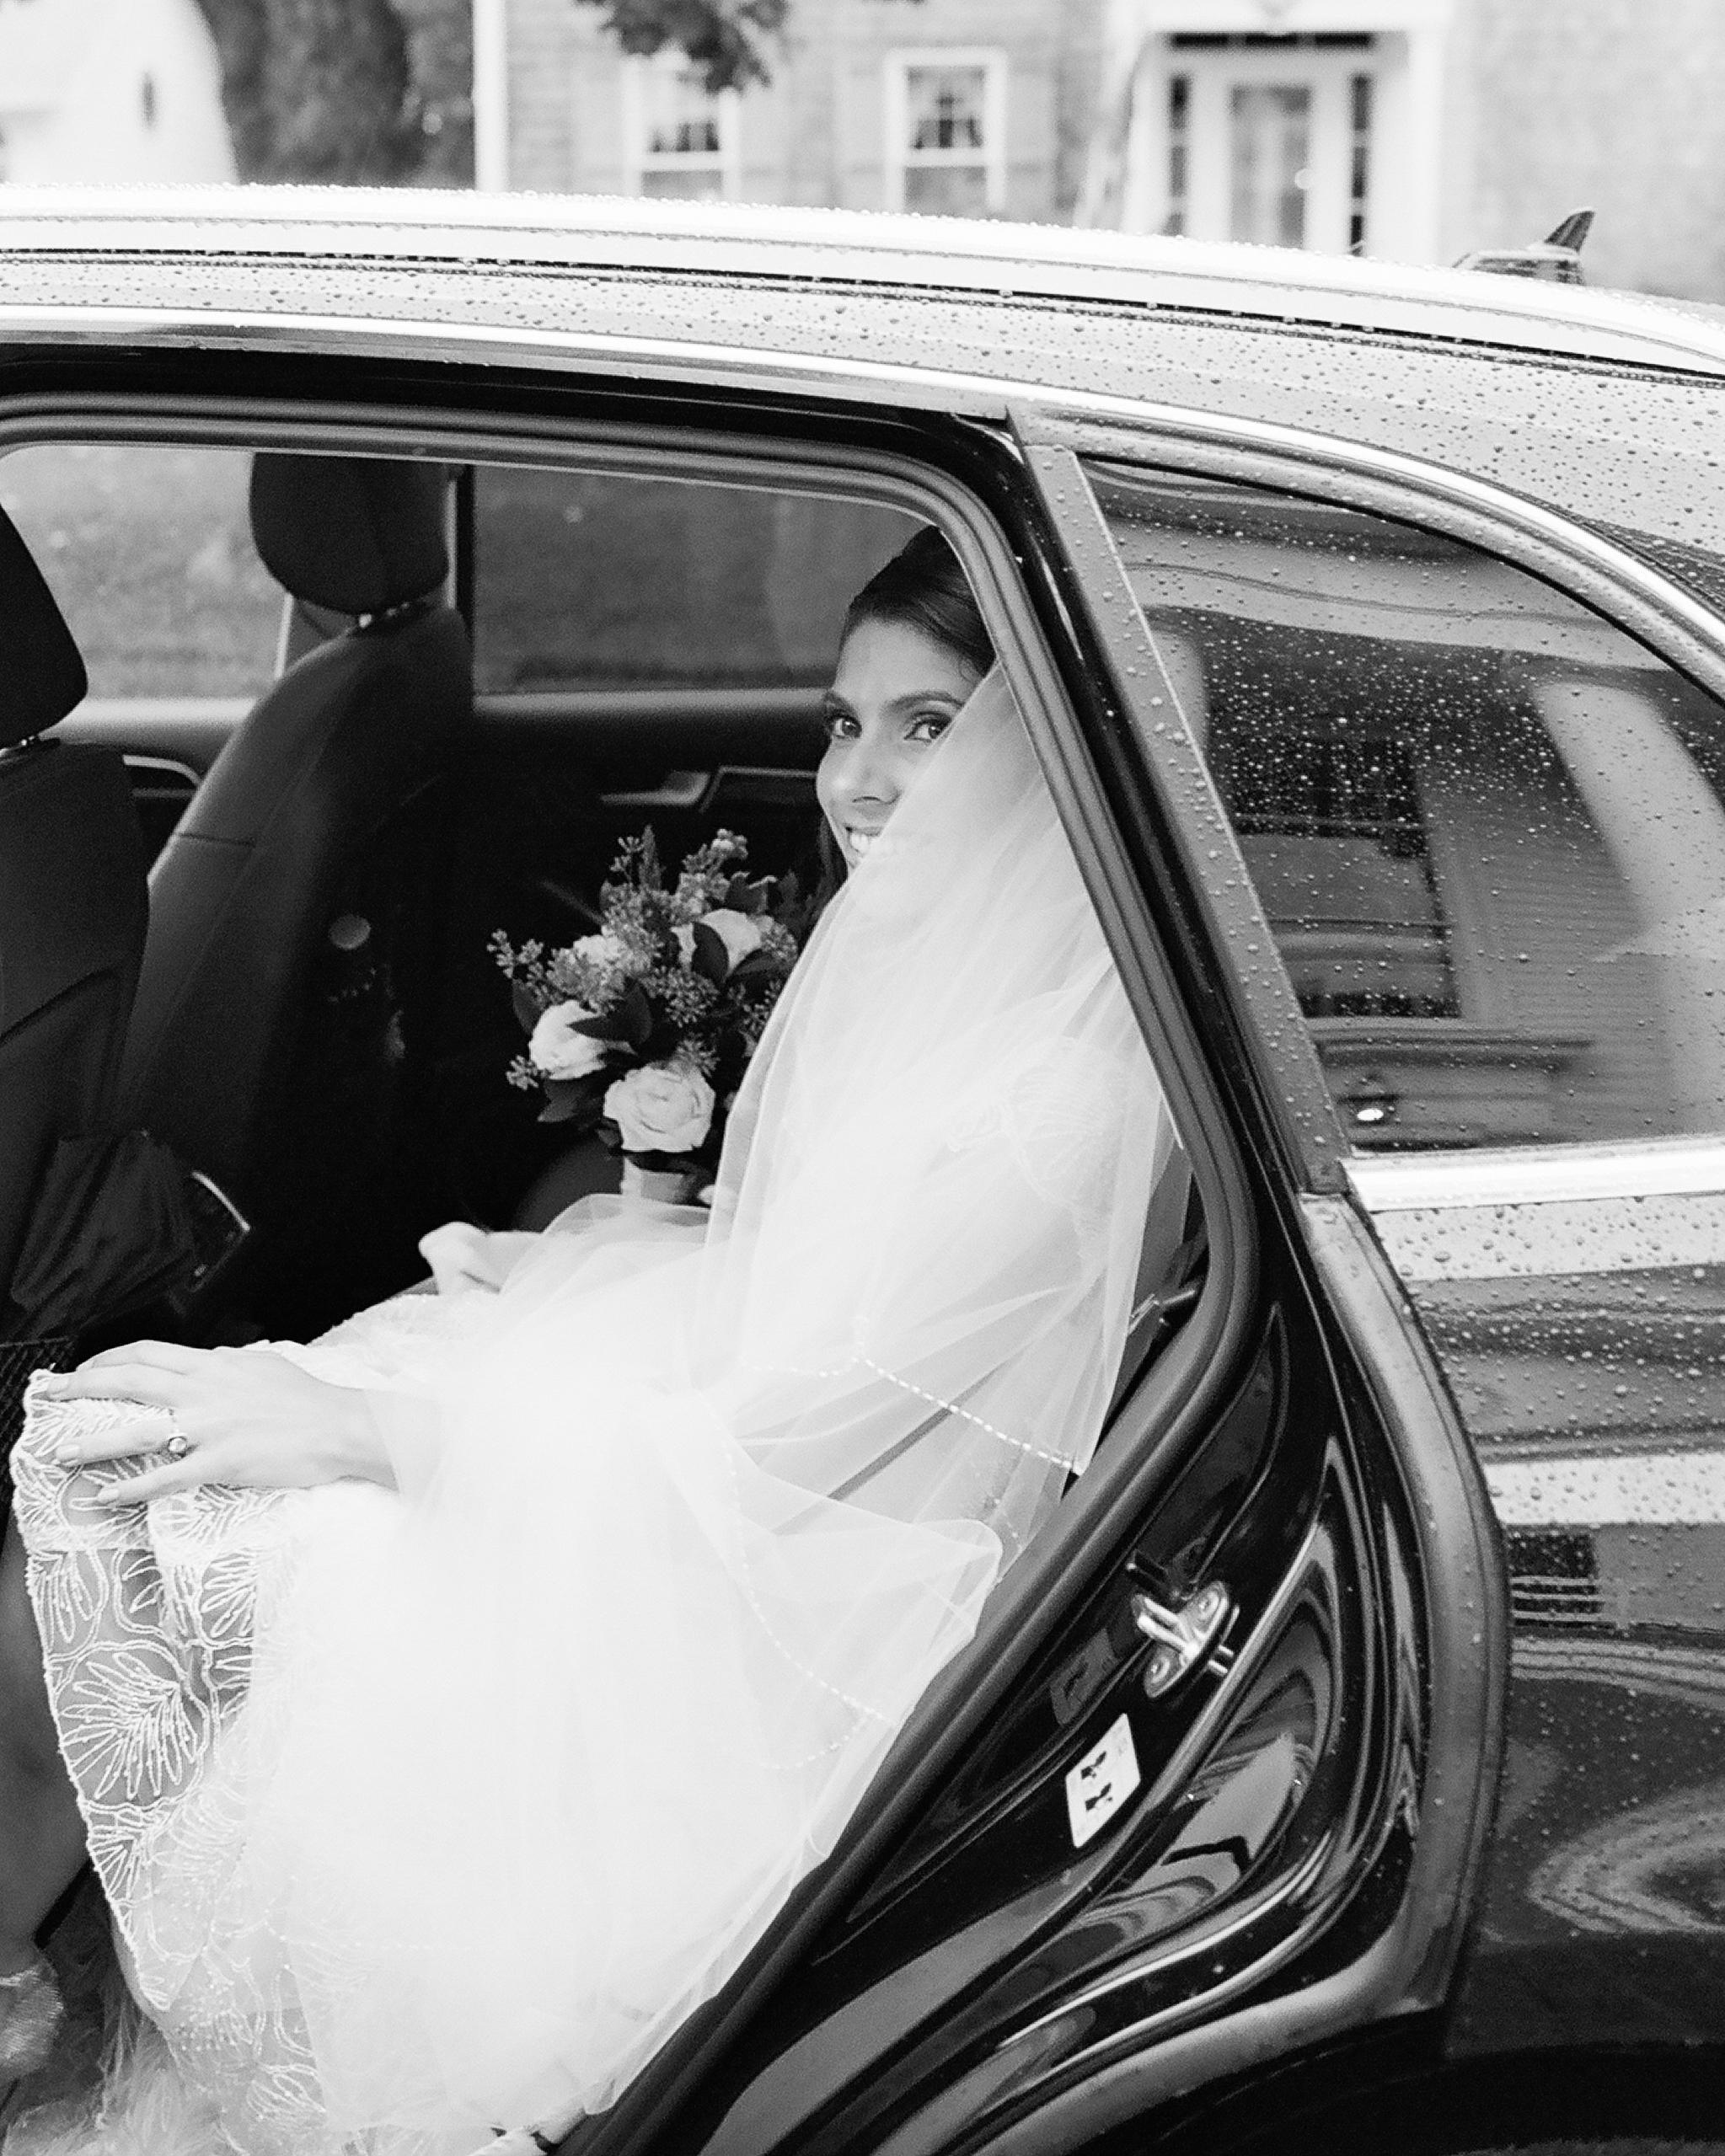 lindsay-garrett-wedding-car-0471-s111850-0415.jpg